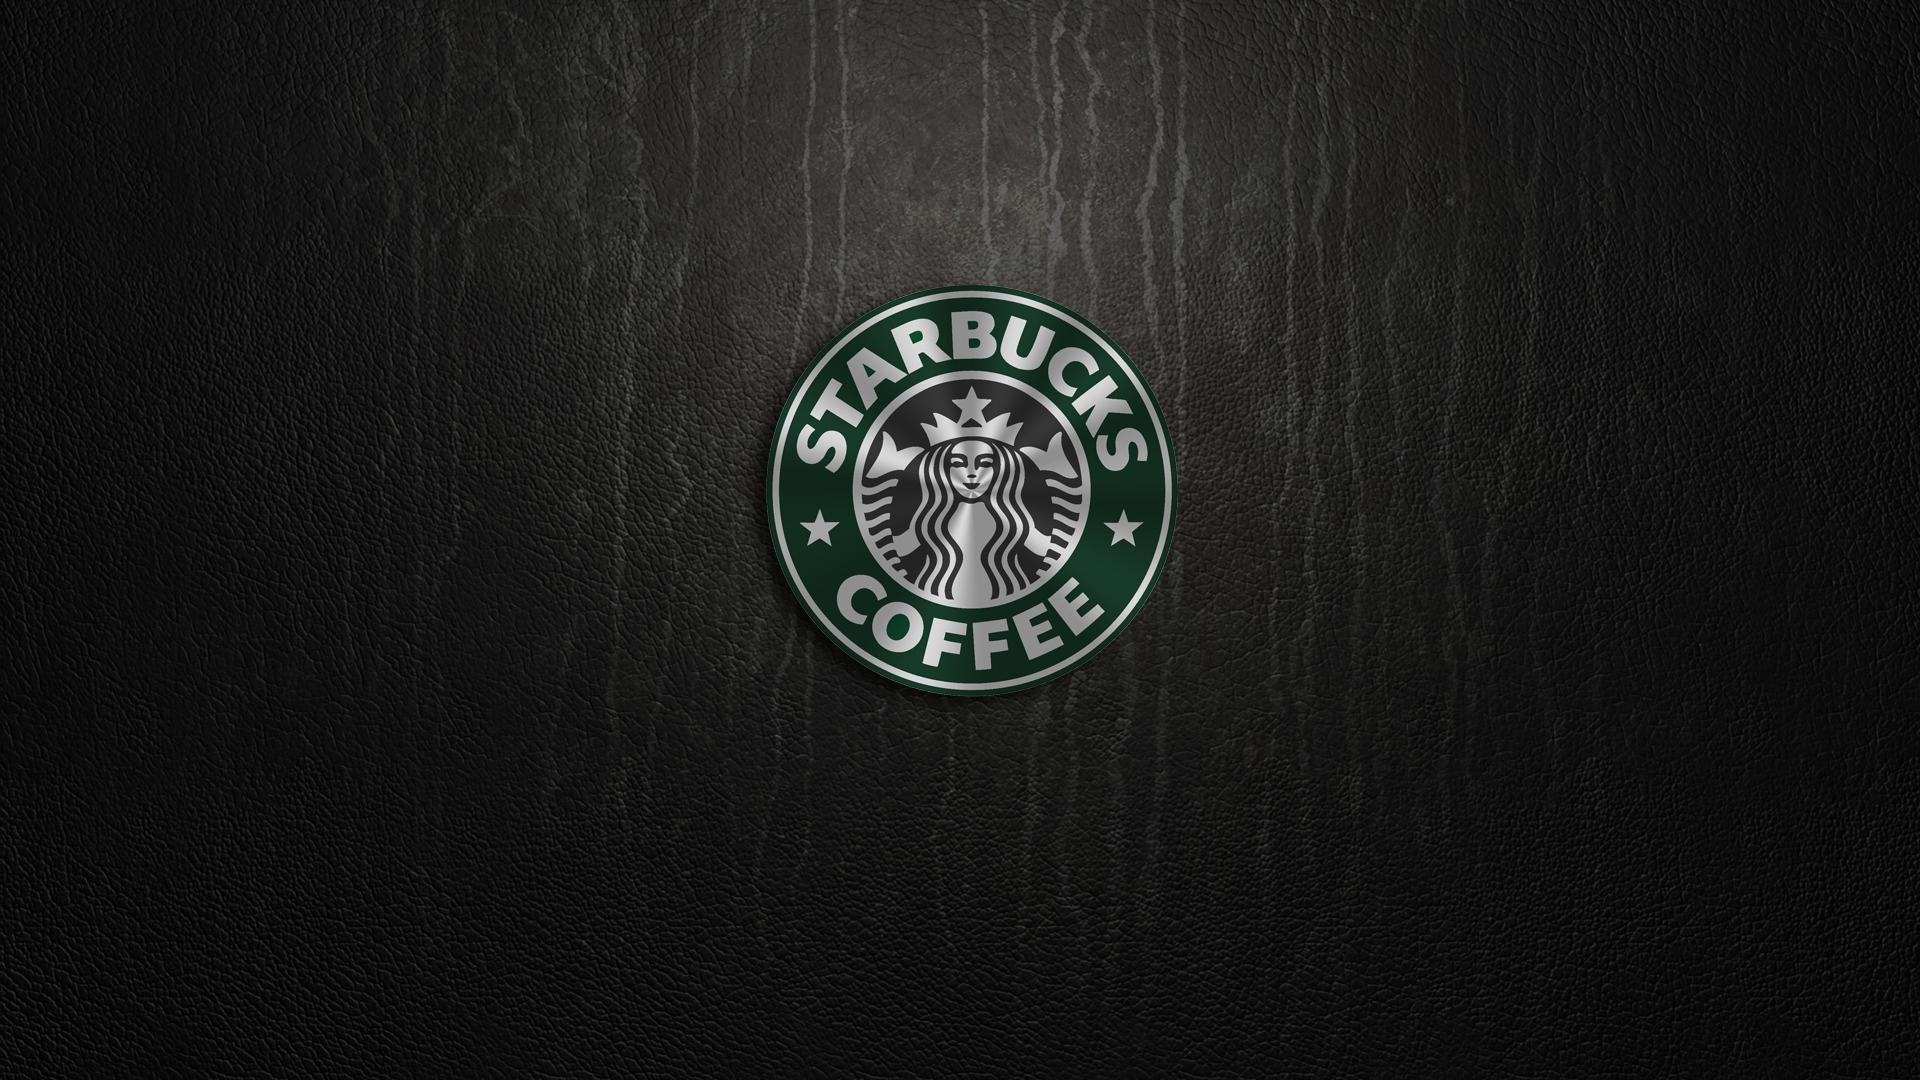 Starbucks wallpaper | 1920x1080 | #67112